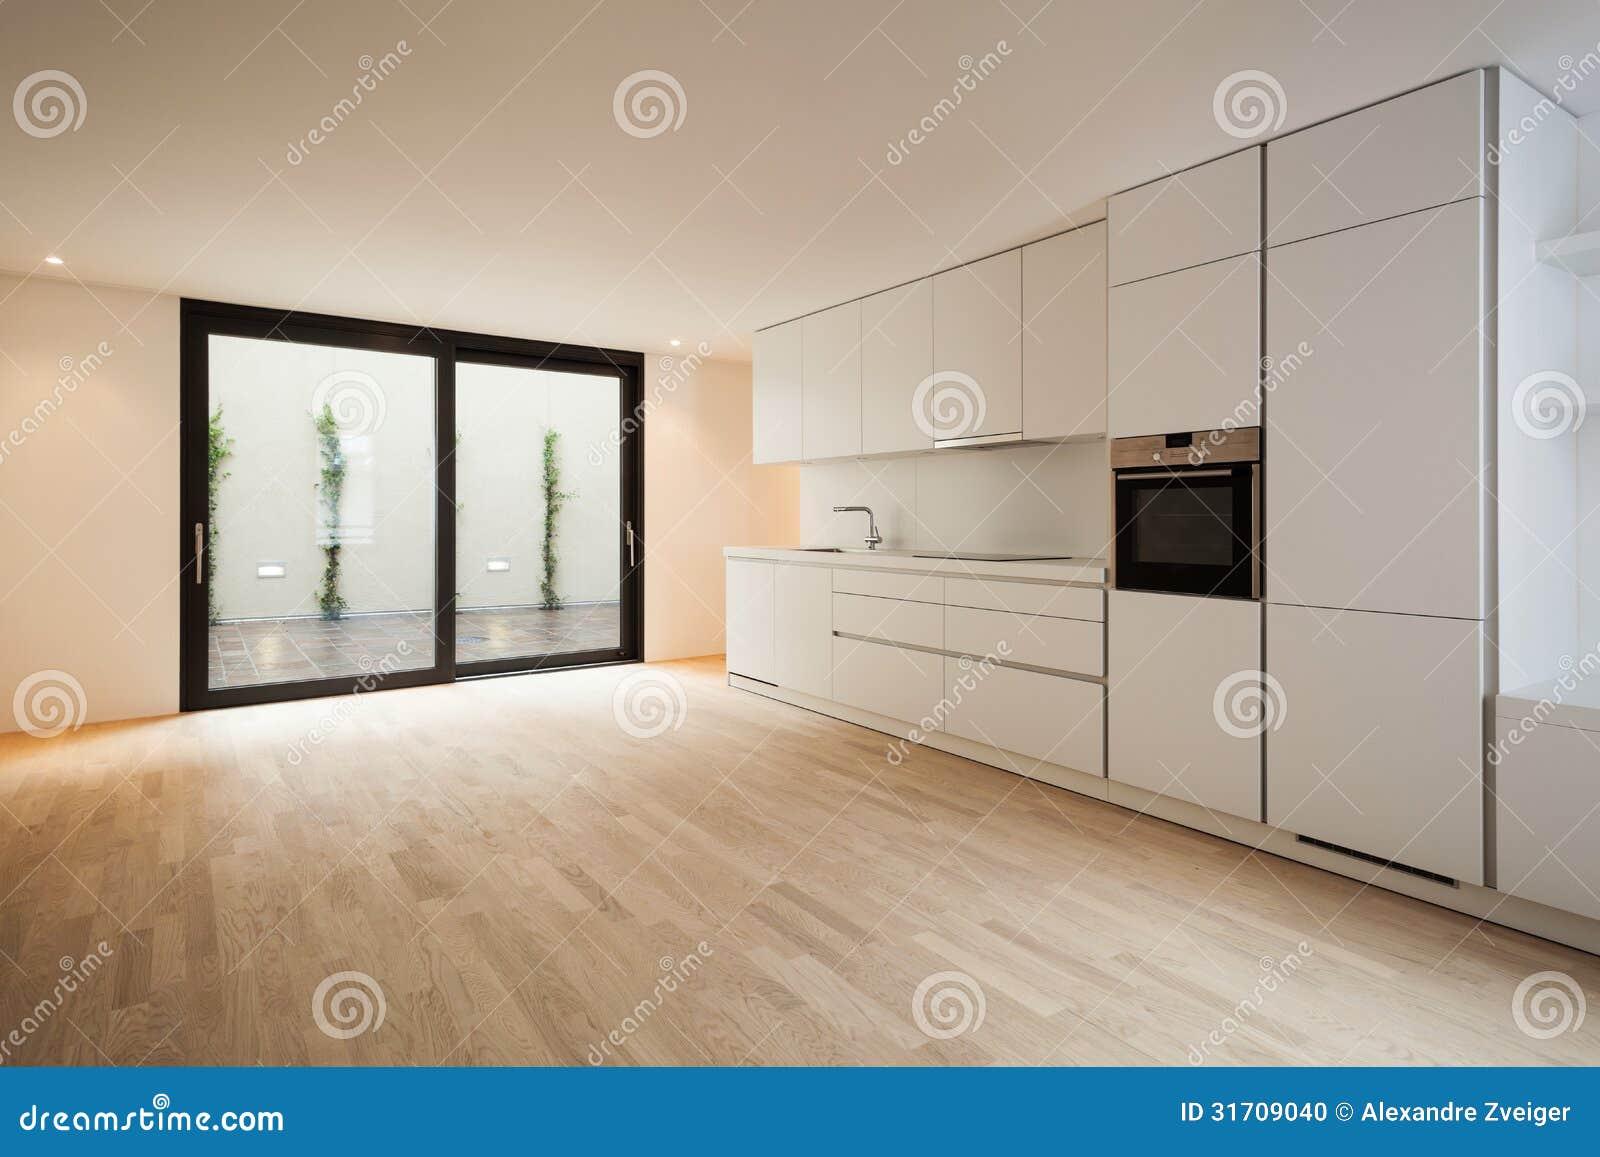 Moderne Witte Keuken Stock Foto - Afbeelding: 31709040